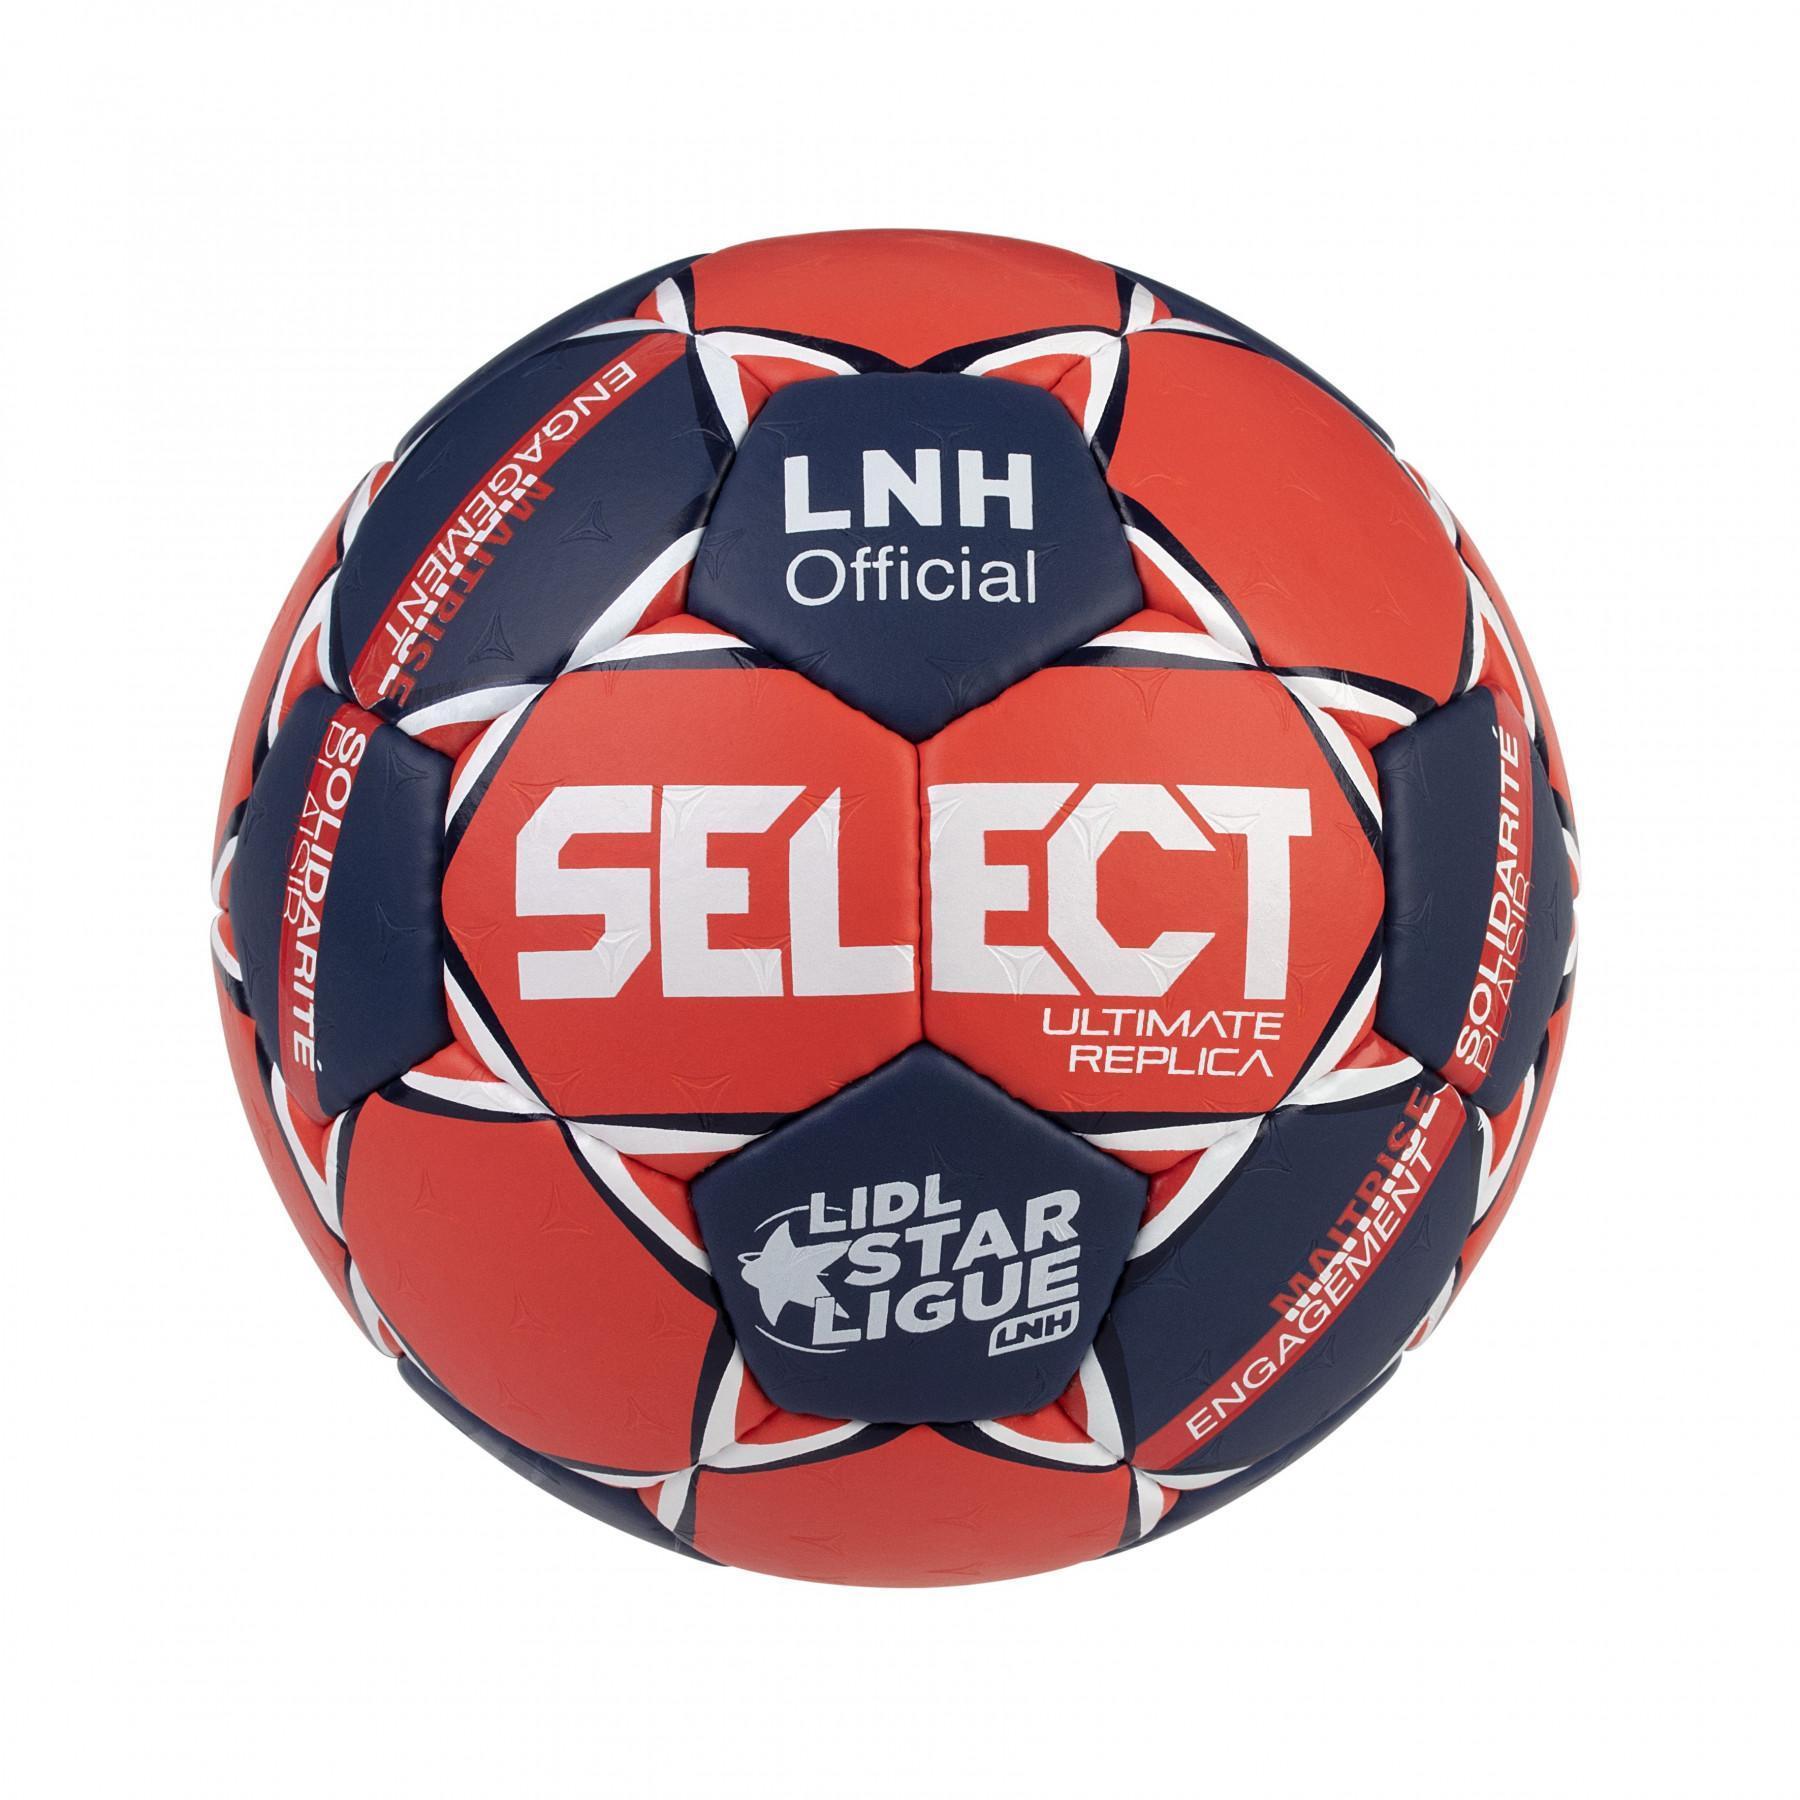 Auswahl der ultimativen NHL-Nachbildung 2020/2021 NHL-Auswahlball